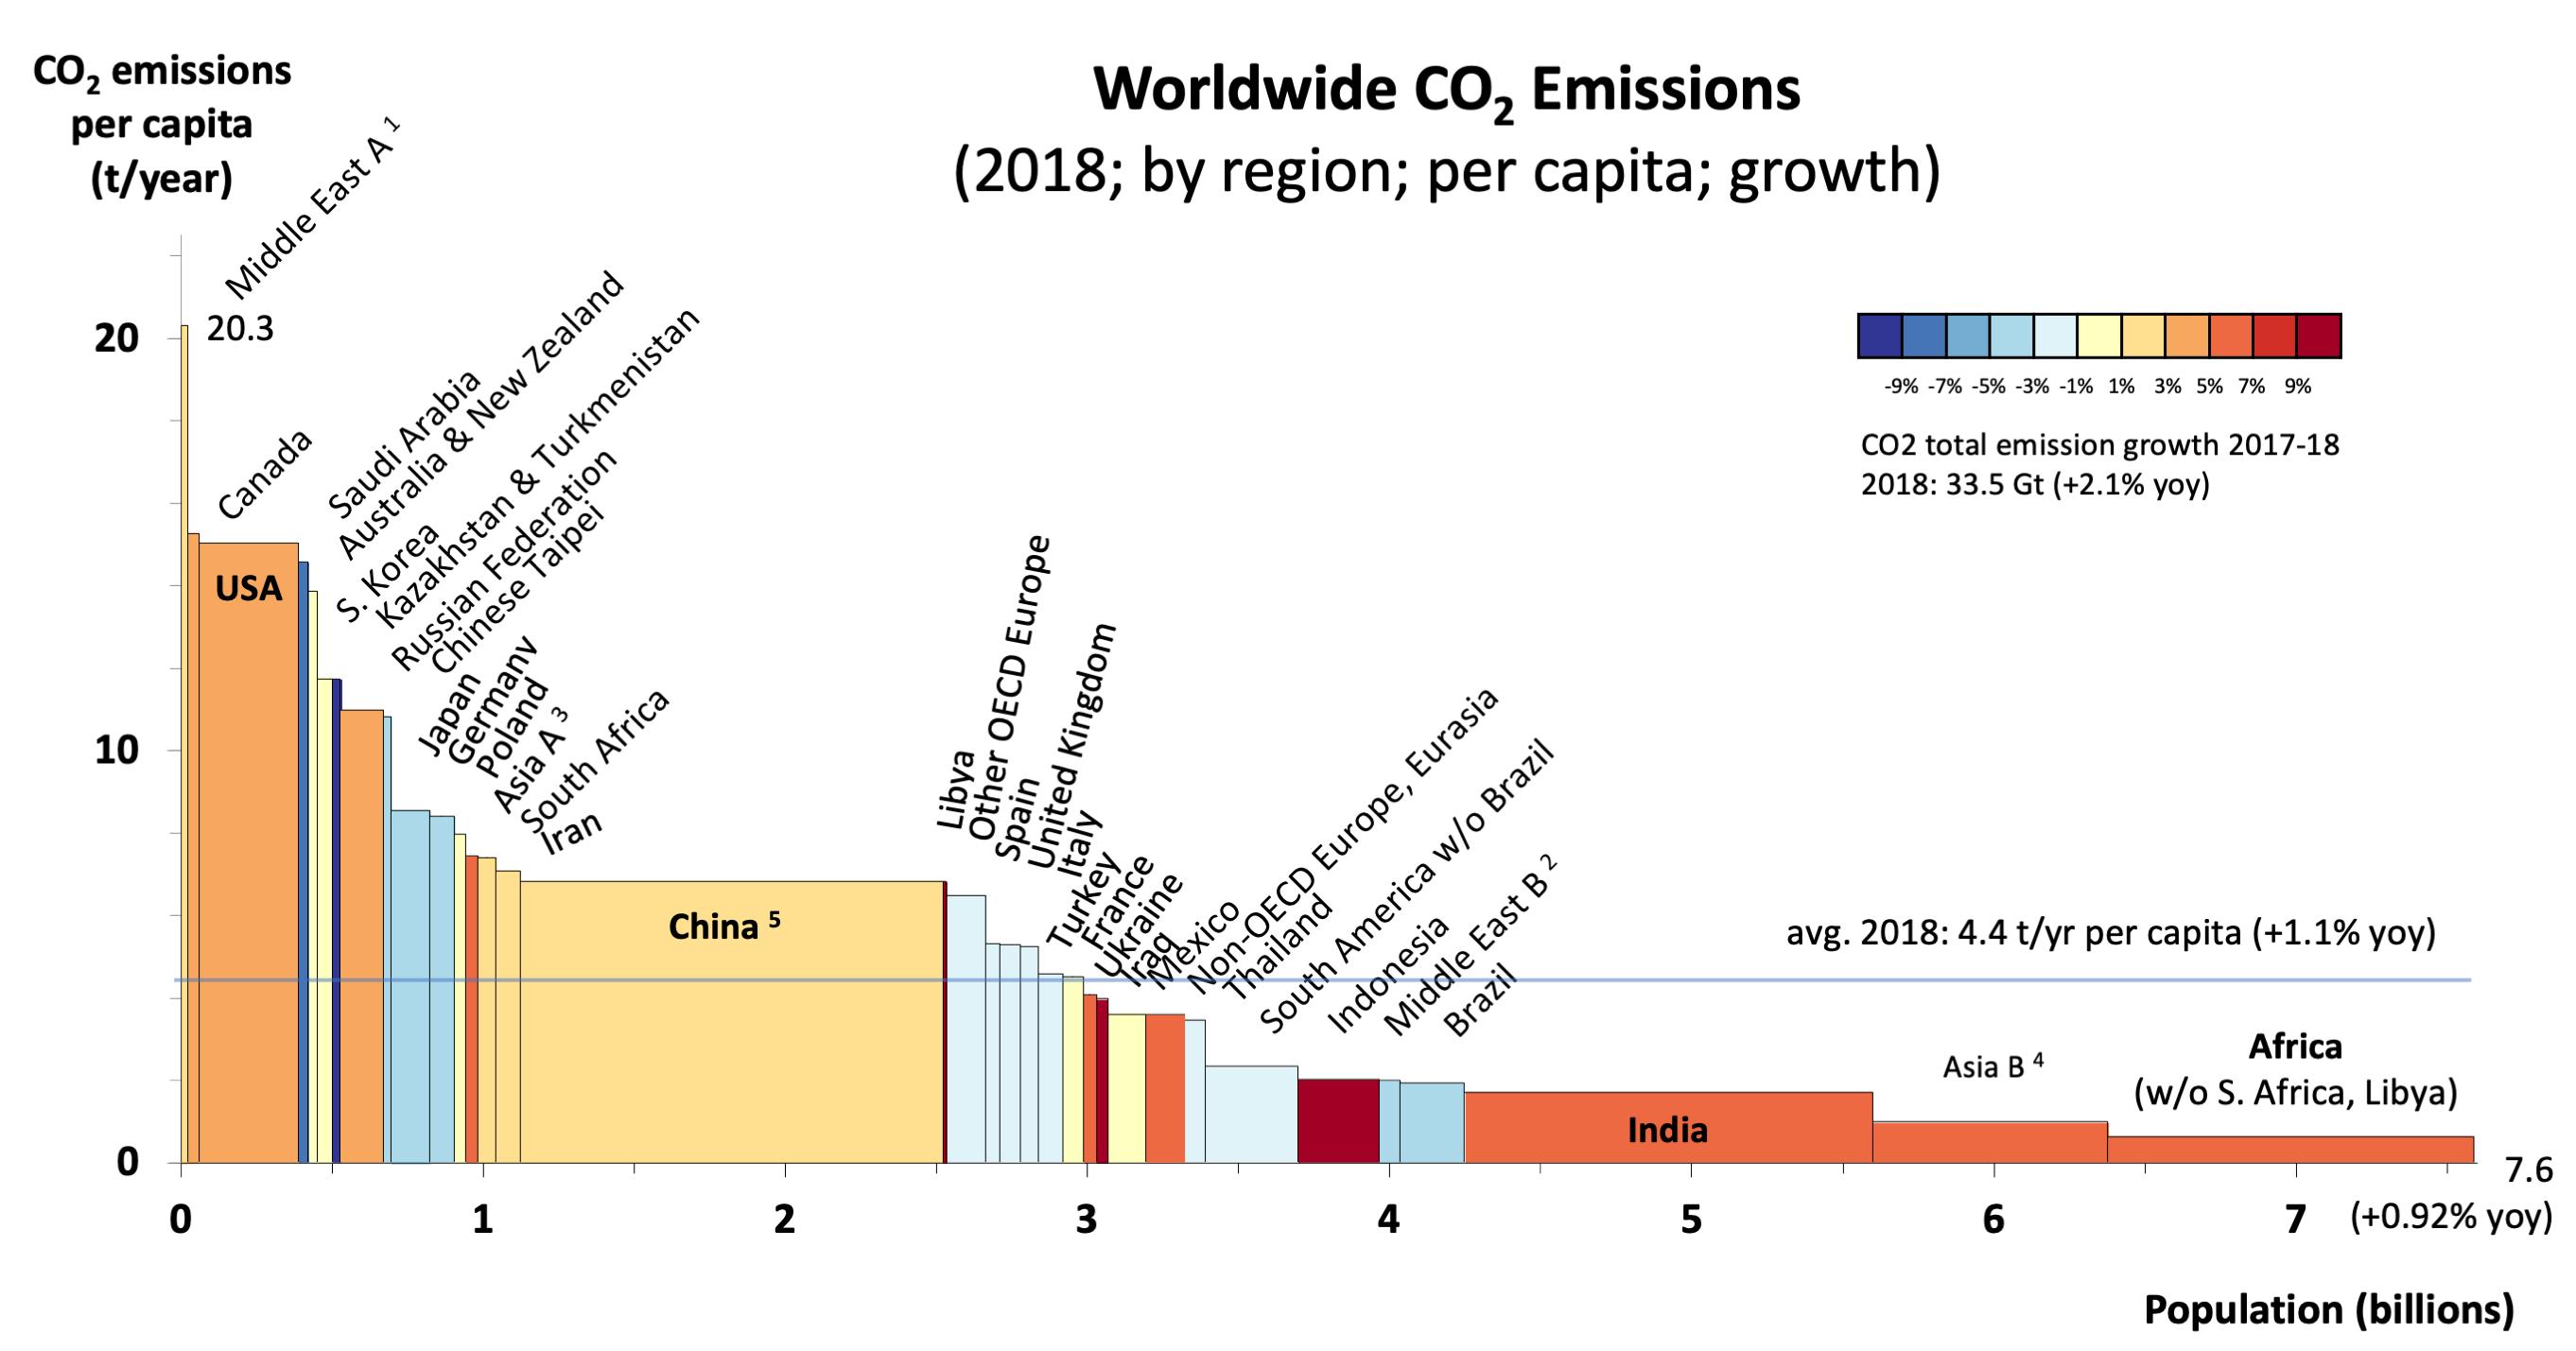 2018 Worldwide CO2 Emissions (variwide chart)